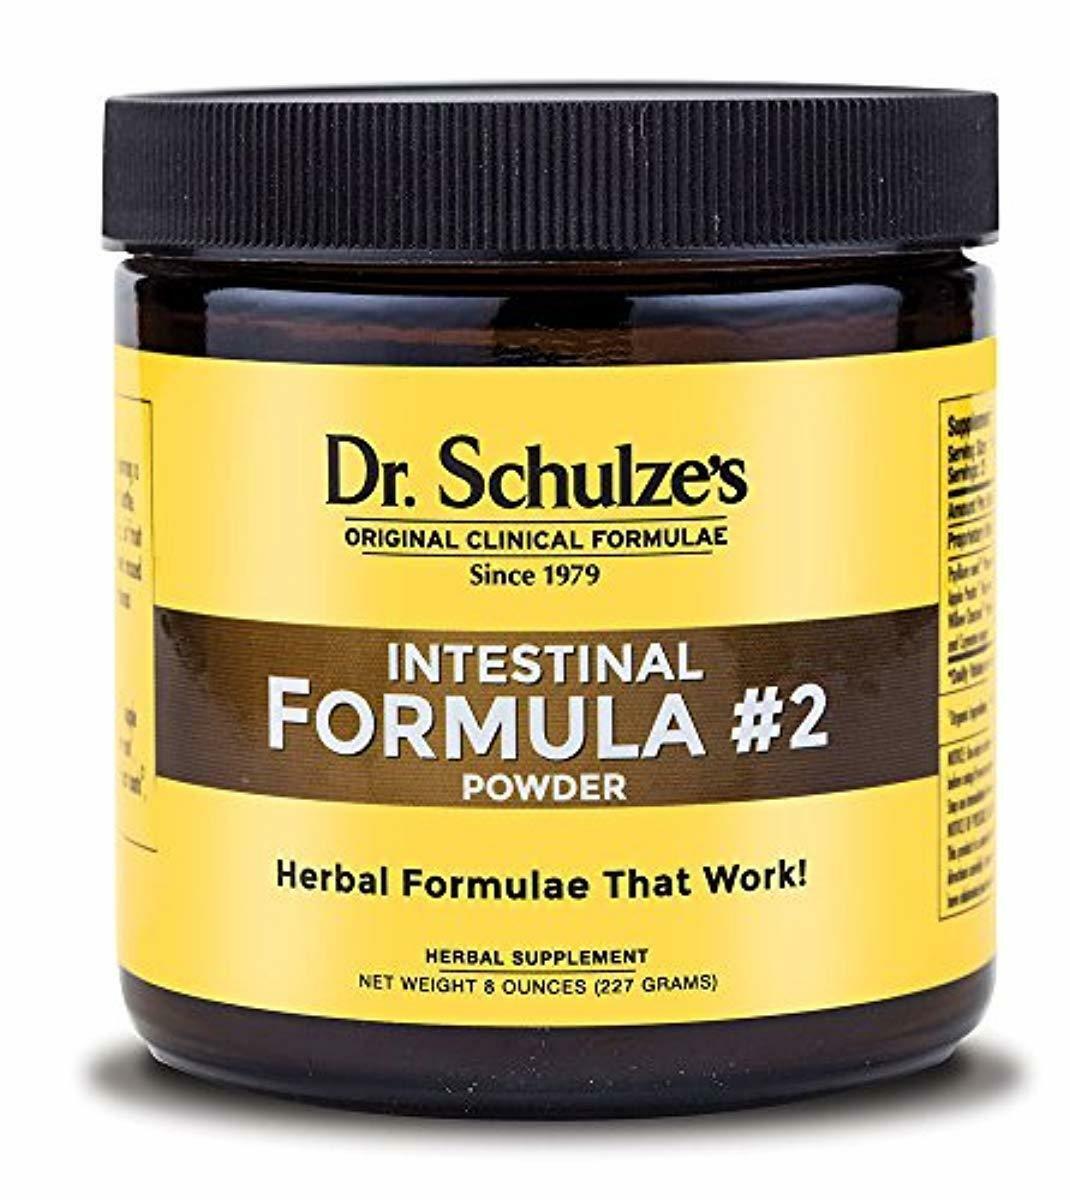 Dr. Schulze's | Intestinal Formula #2 | Herbal Colon Clean